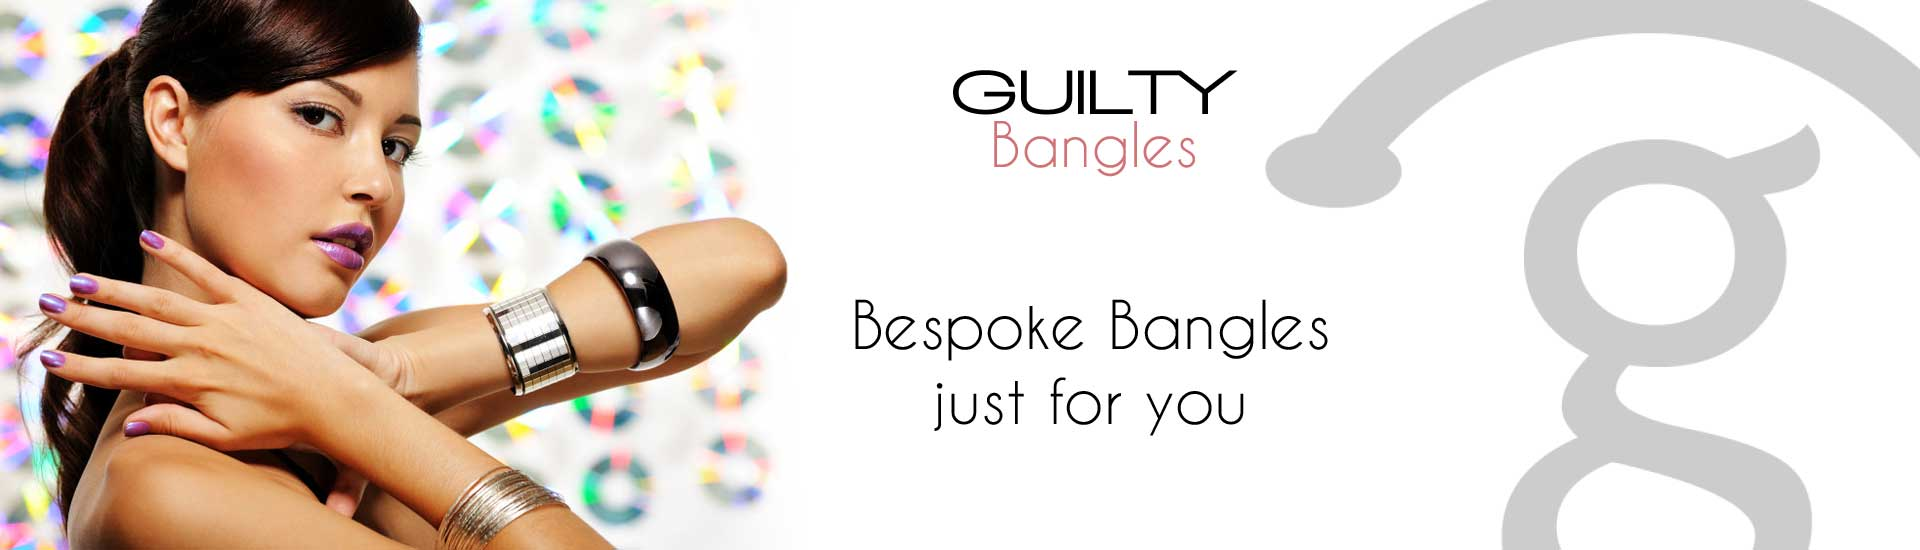 Bespoke Bangles for You